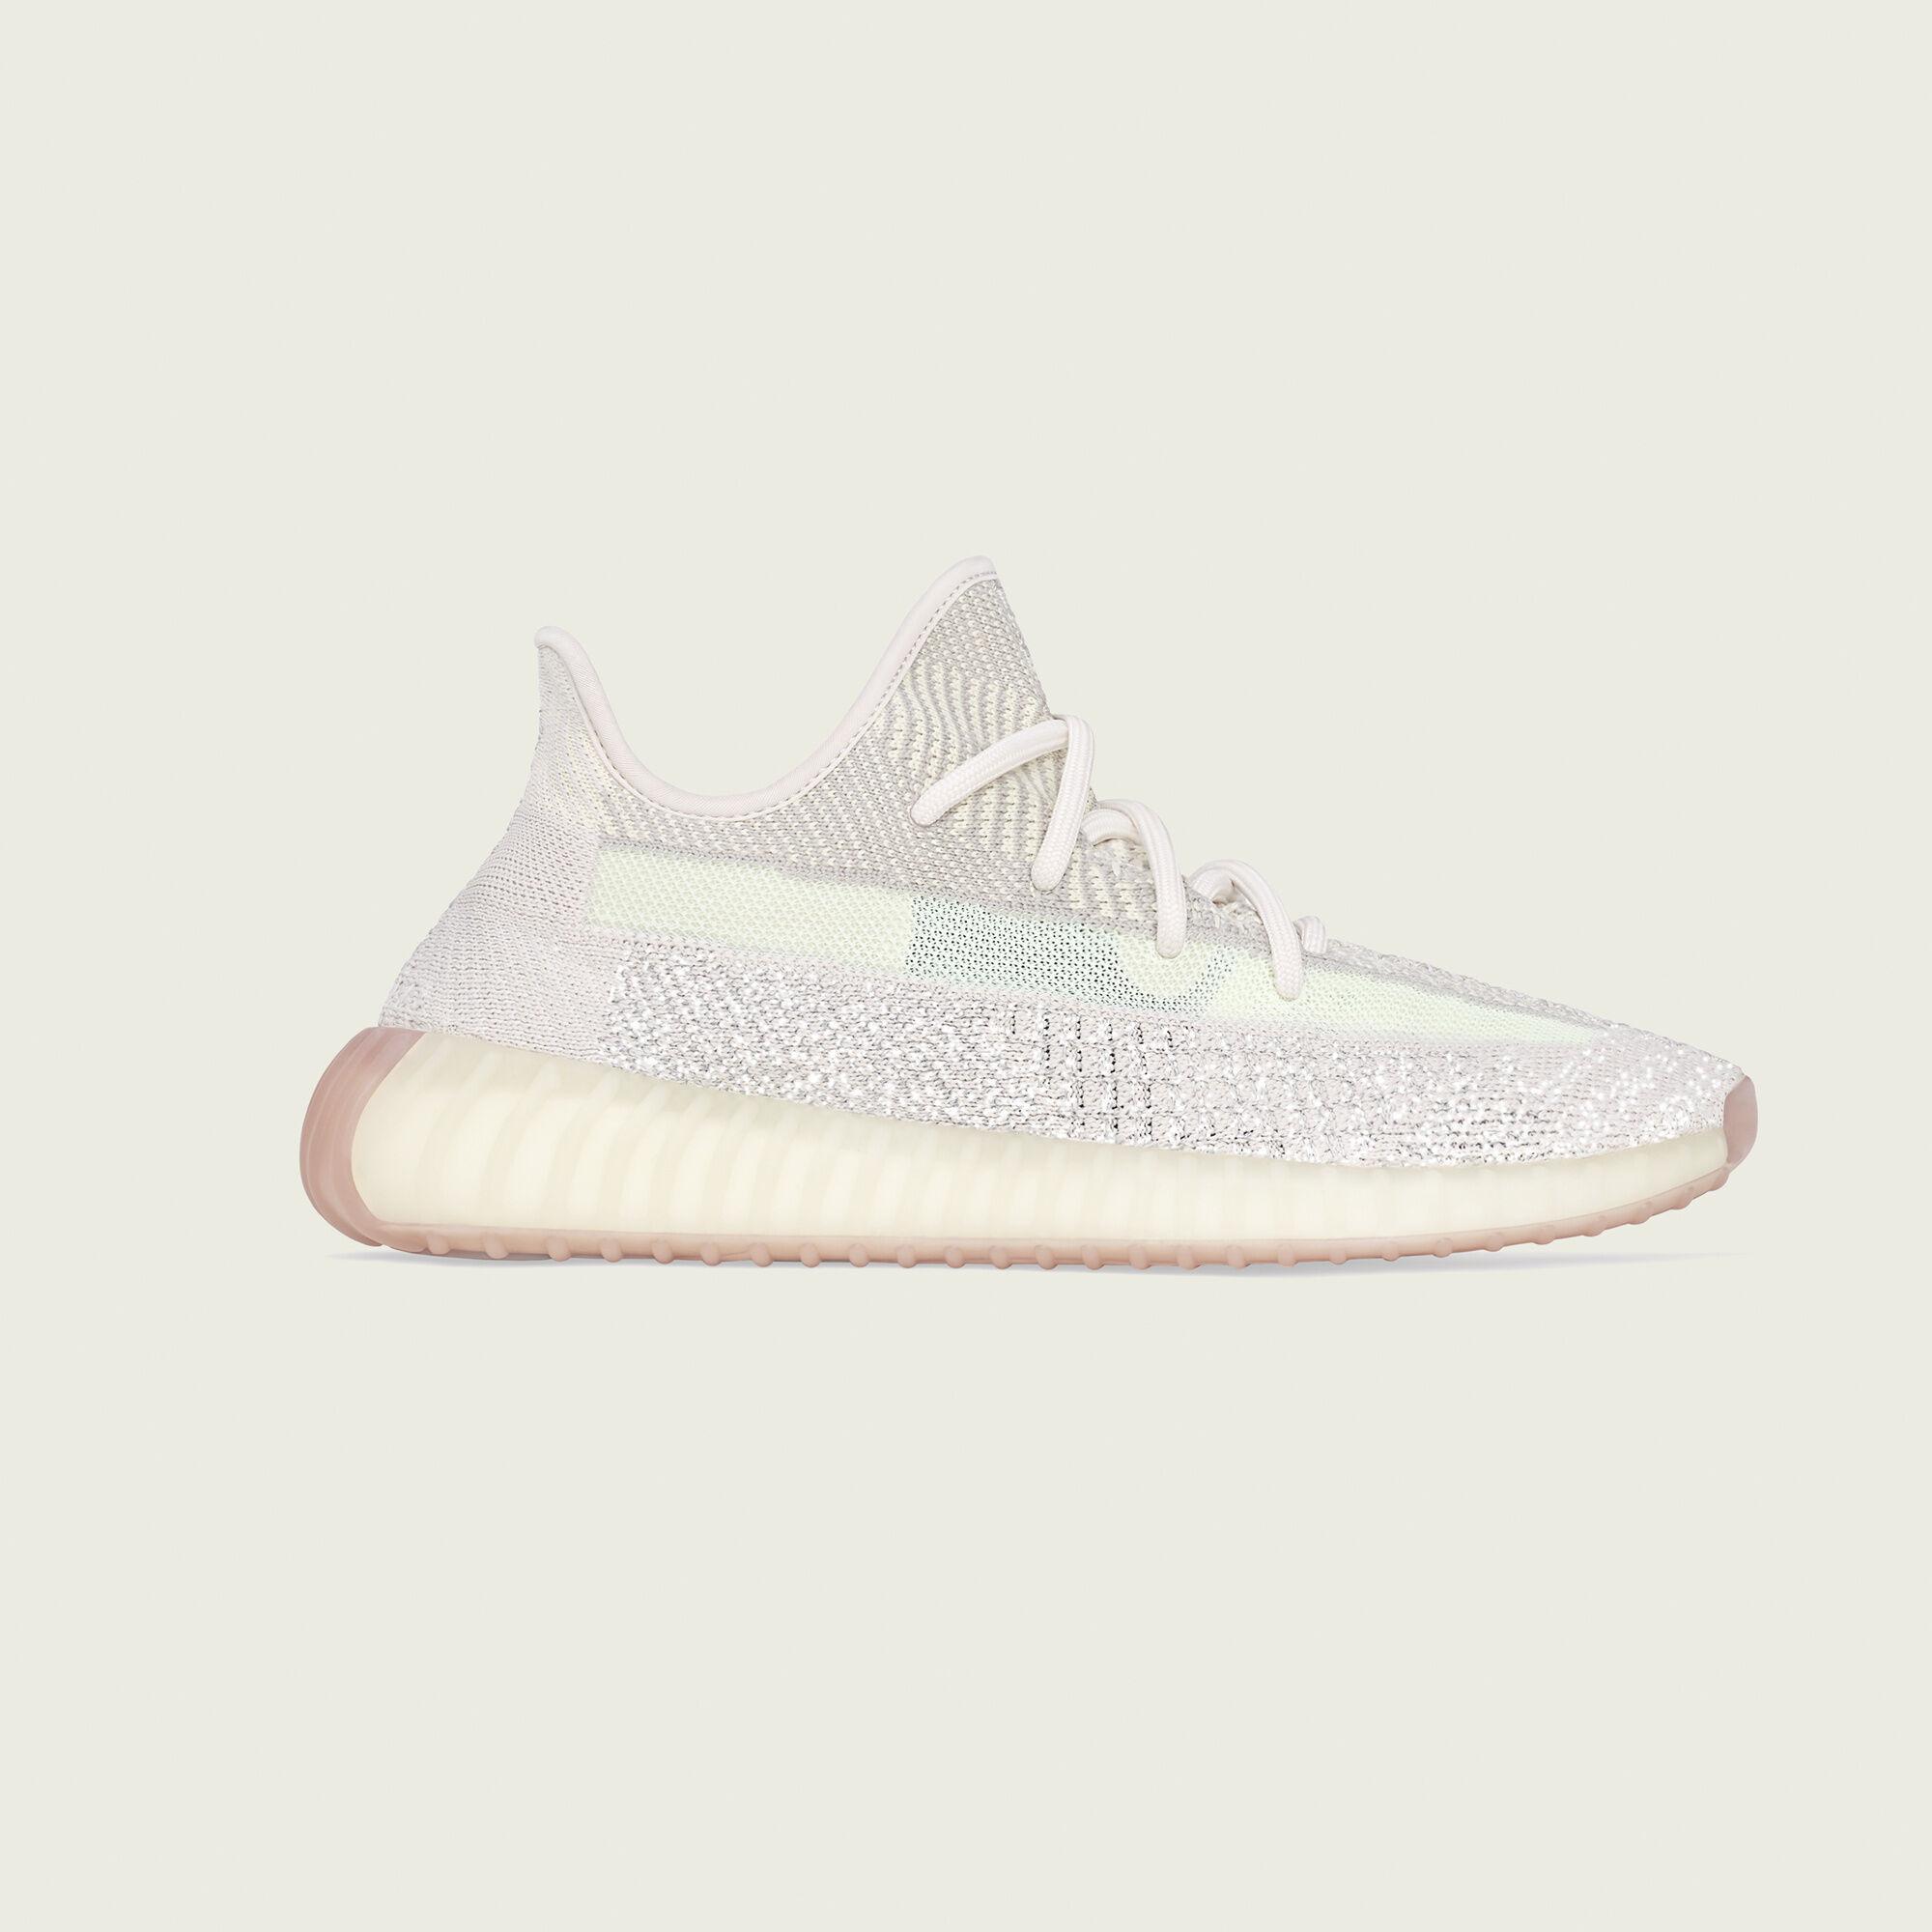 01-adidas-yeezy-boost-350-v2-citrin-non-reflective-fw3042